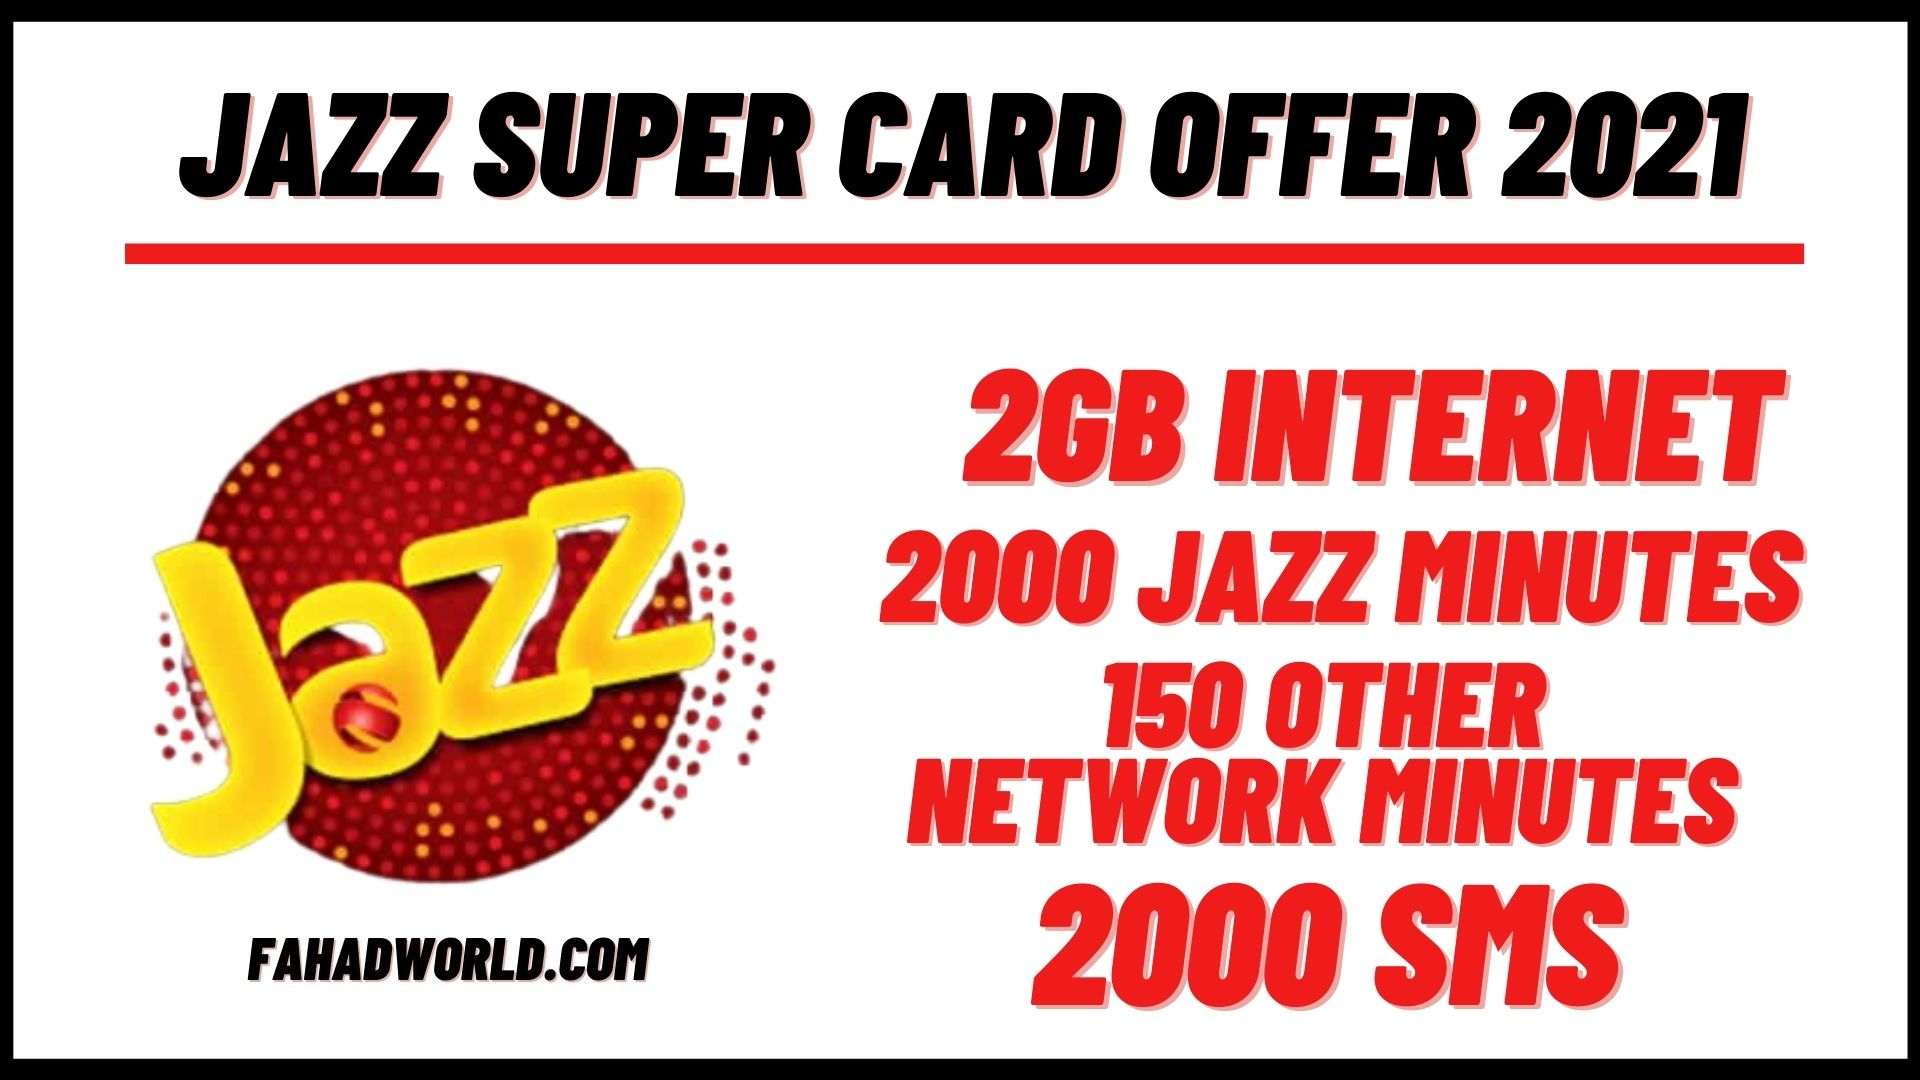 jazz super card offer